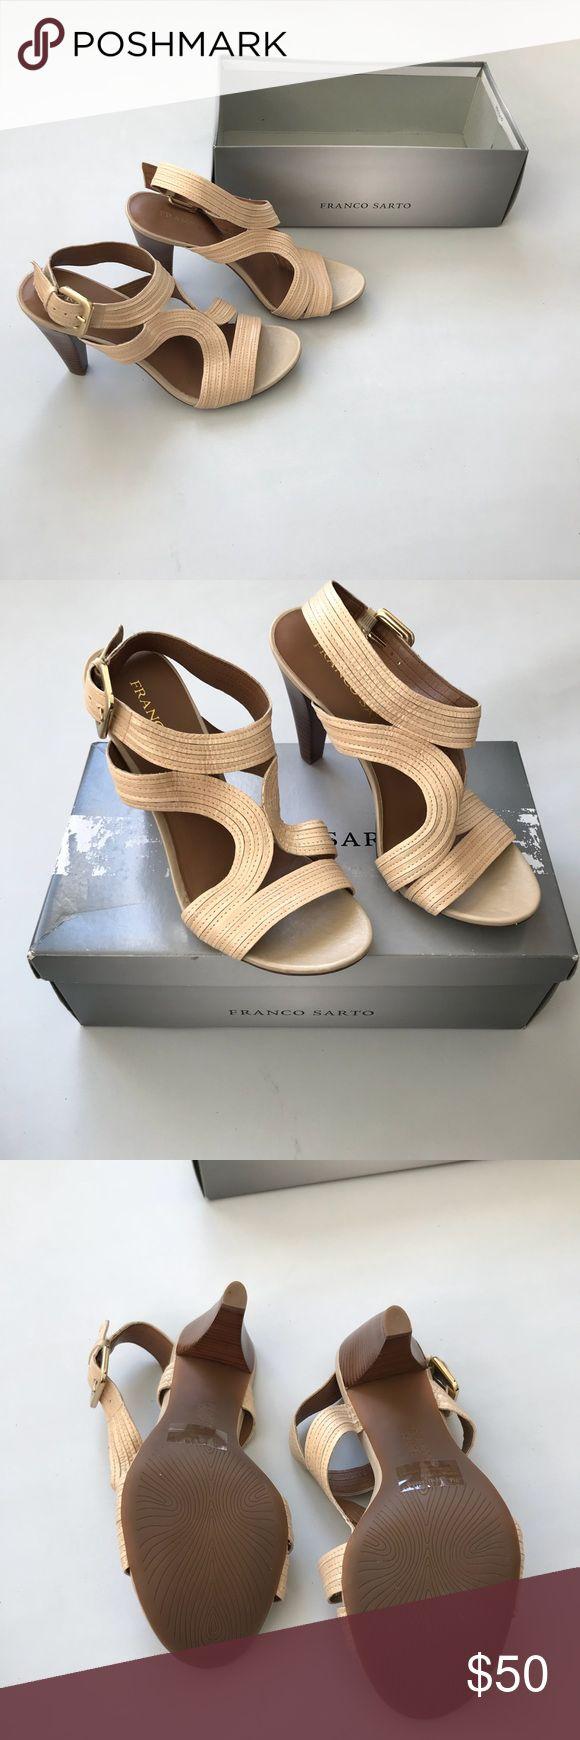 Franco Sarto Sandal Heels sz7M Adonis color cream Franco Sarto Sandal Heels size 7M Adonis color cream Strappy Sandal Heels. Franco Sarto Shoes Heels